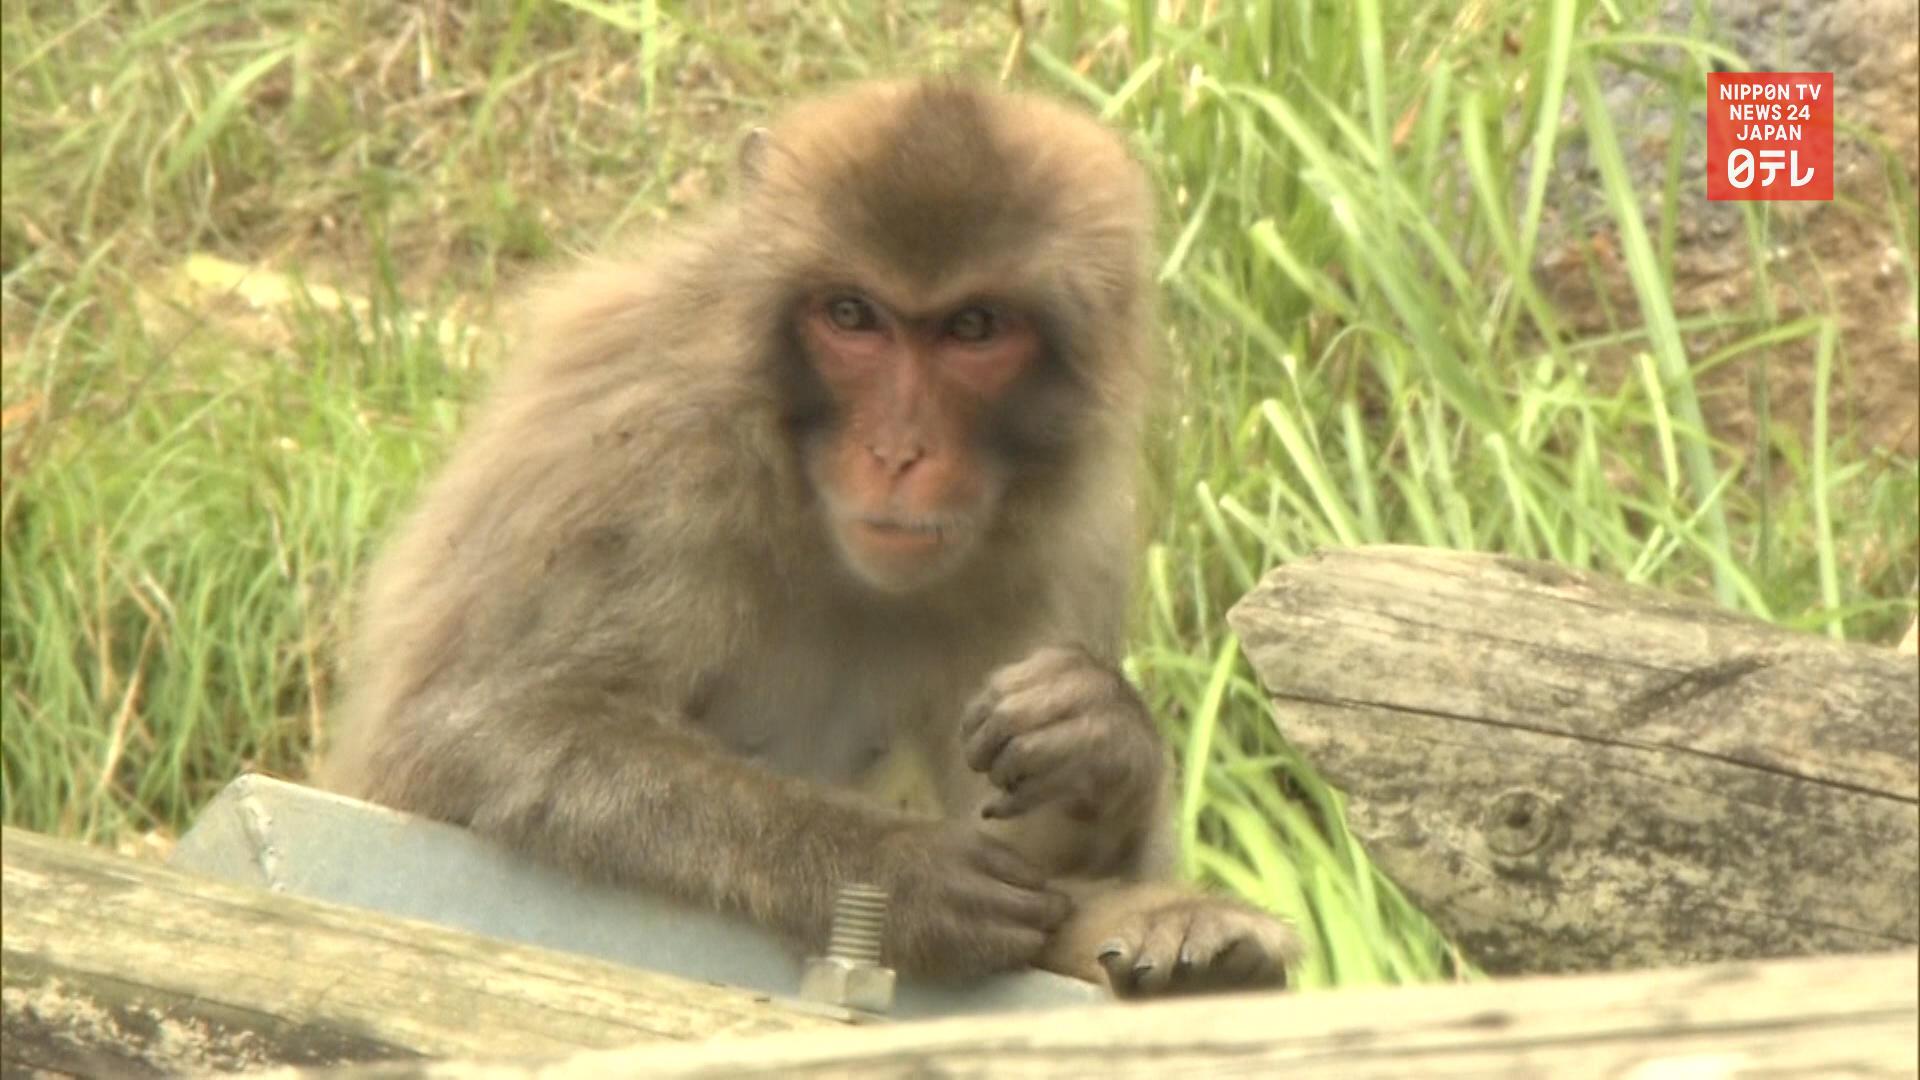 70 monkeys escape their pen again